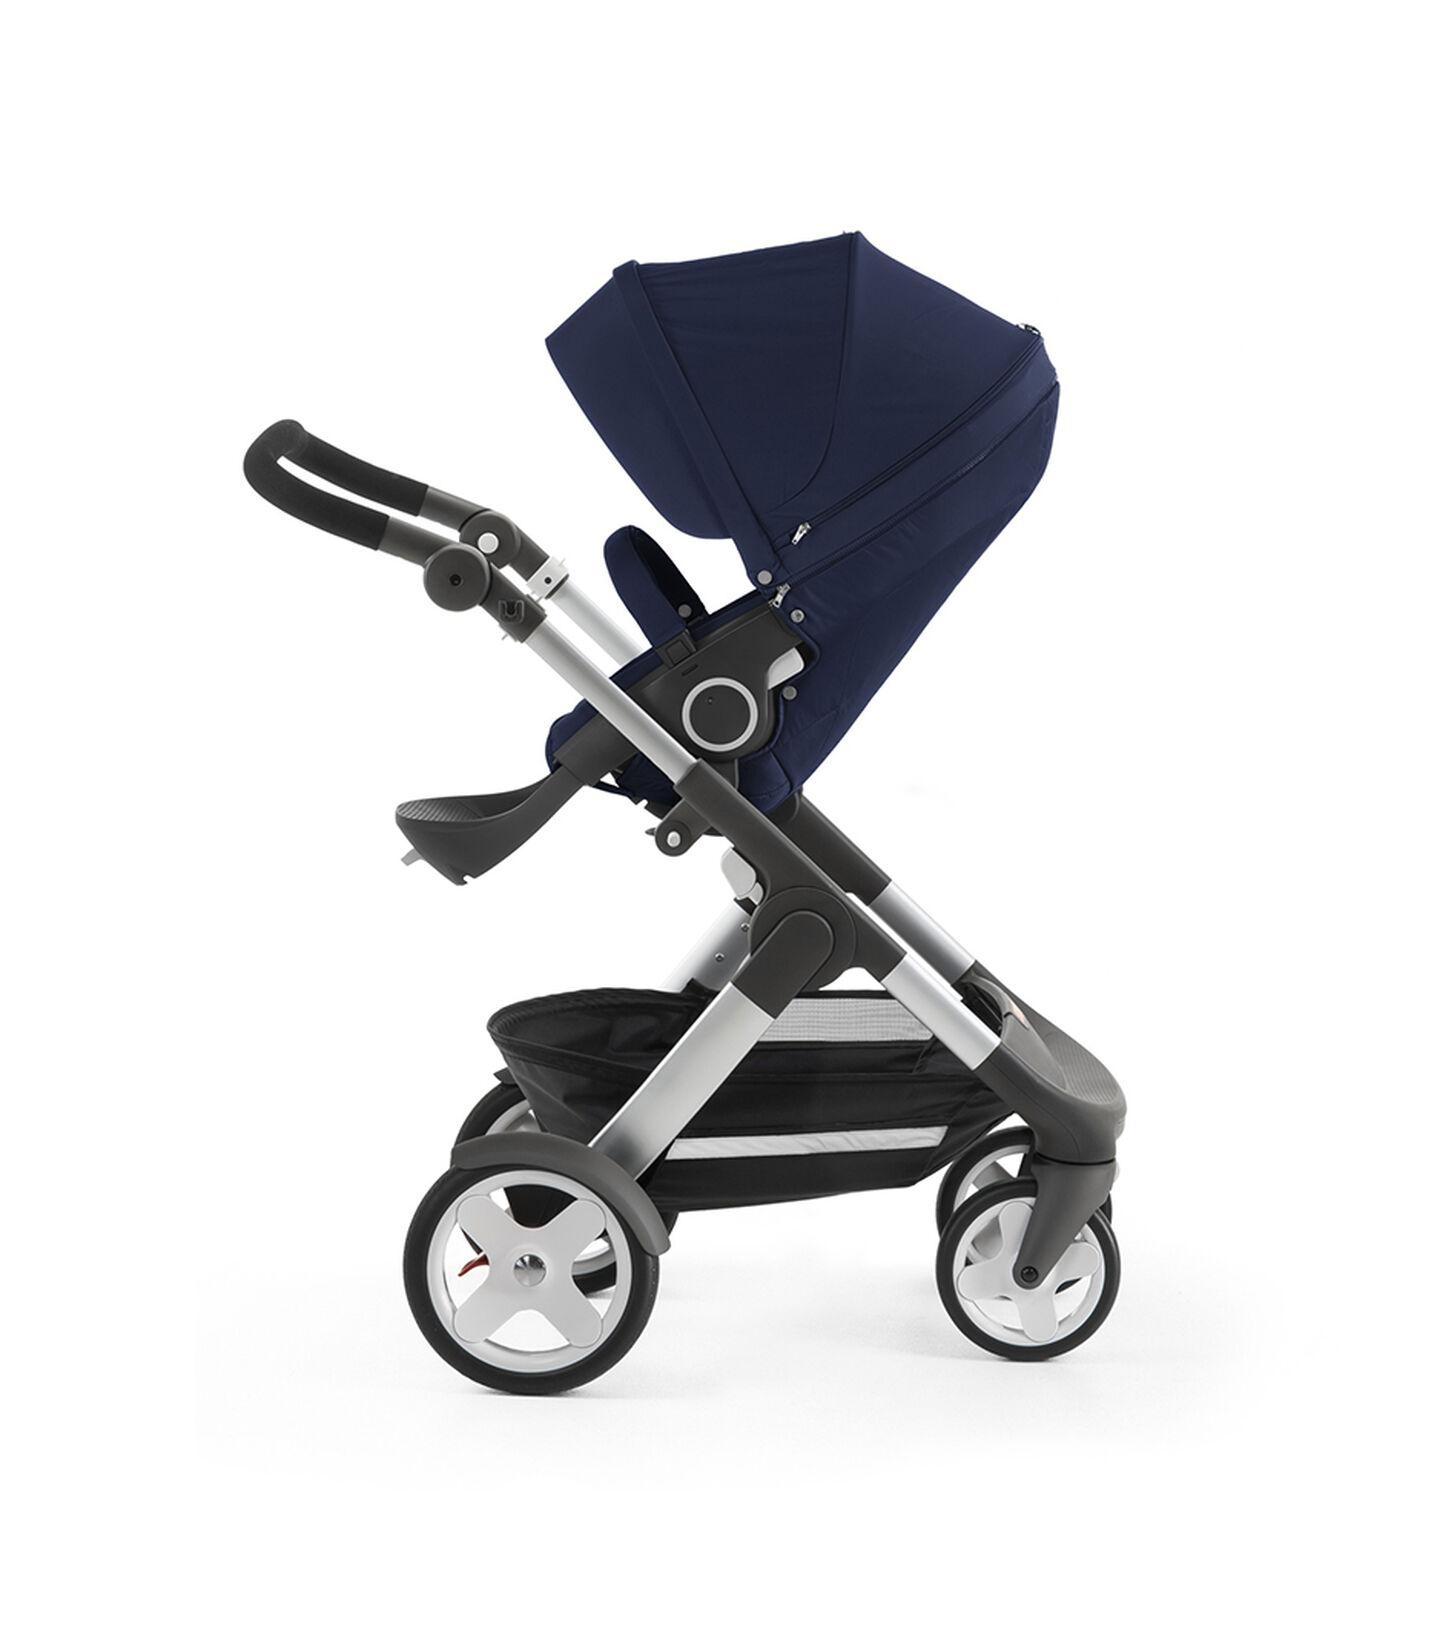 Stokke® Trailz™ with Stokke® Stroller Seat, Deep Blue. Classic Wheels. view 2